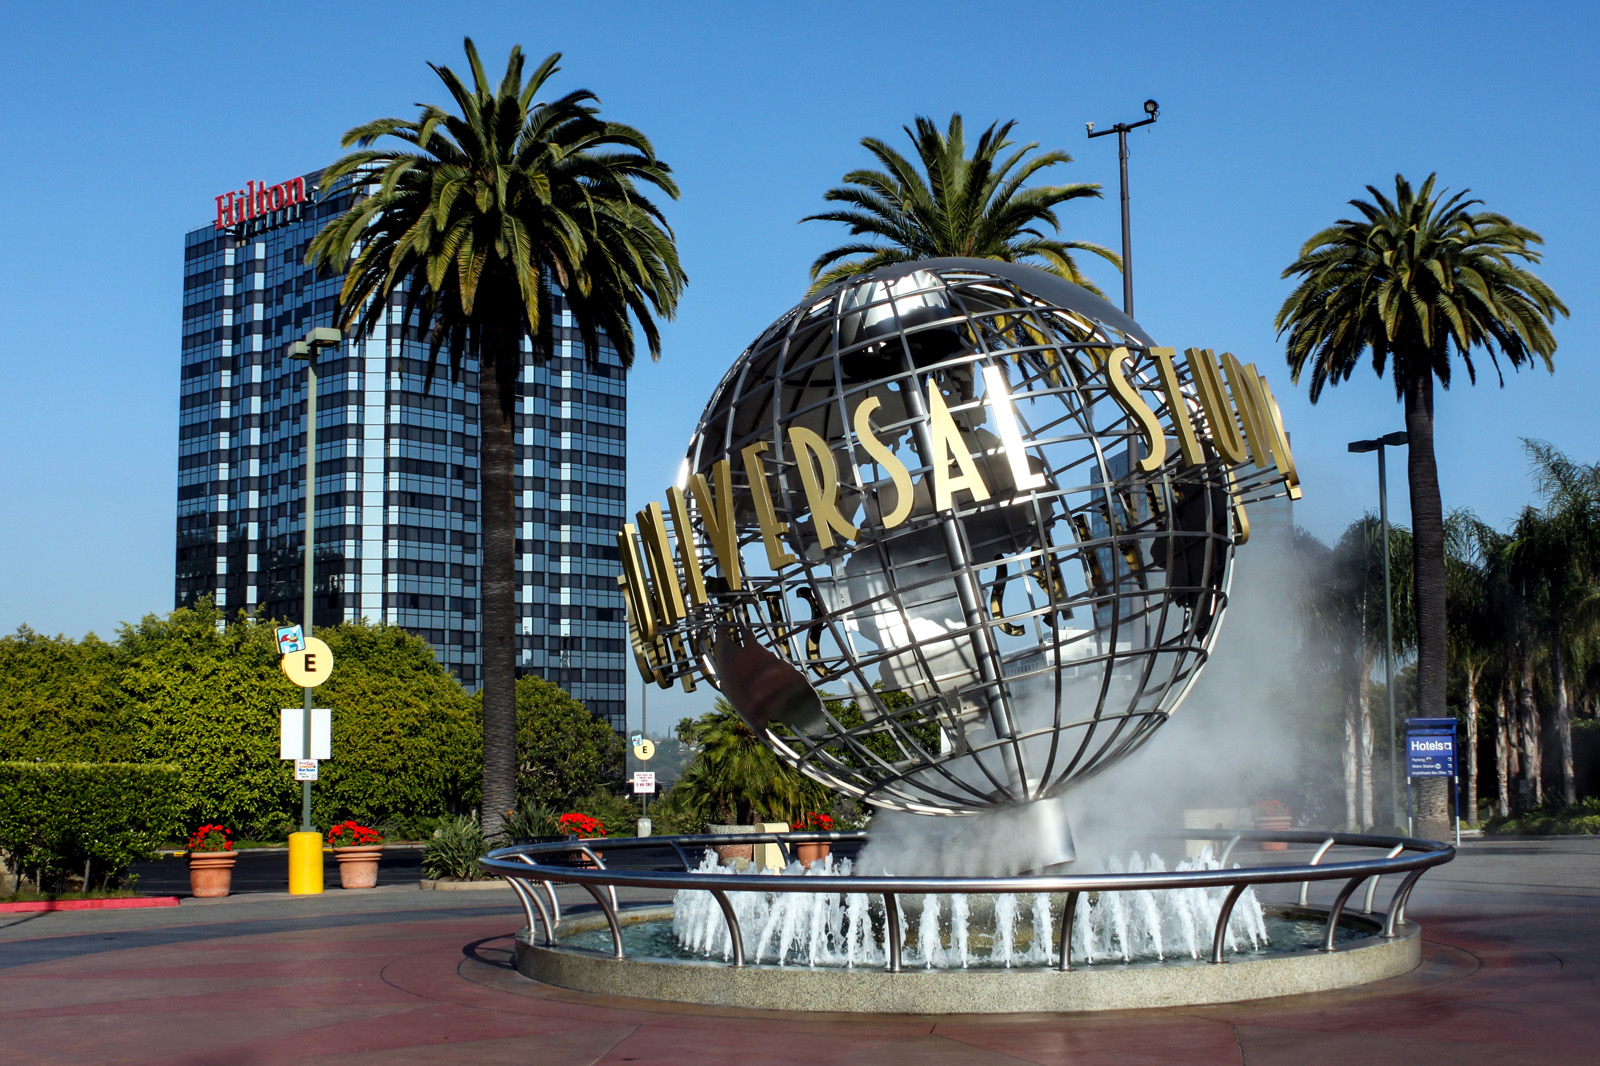 Entrée des Studios Universal d'Hollywood, Los Angeles